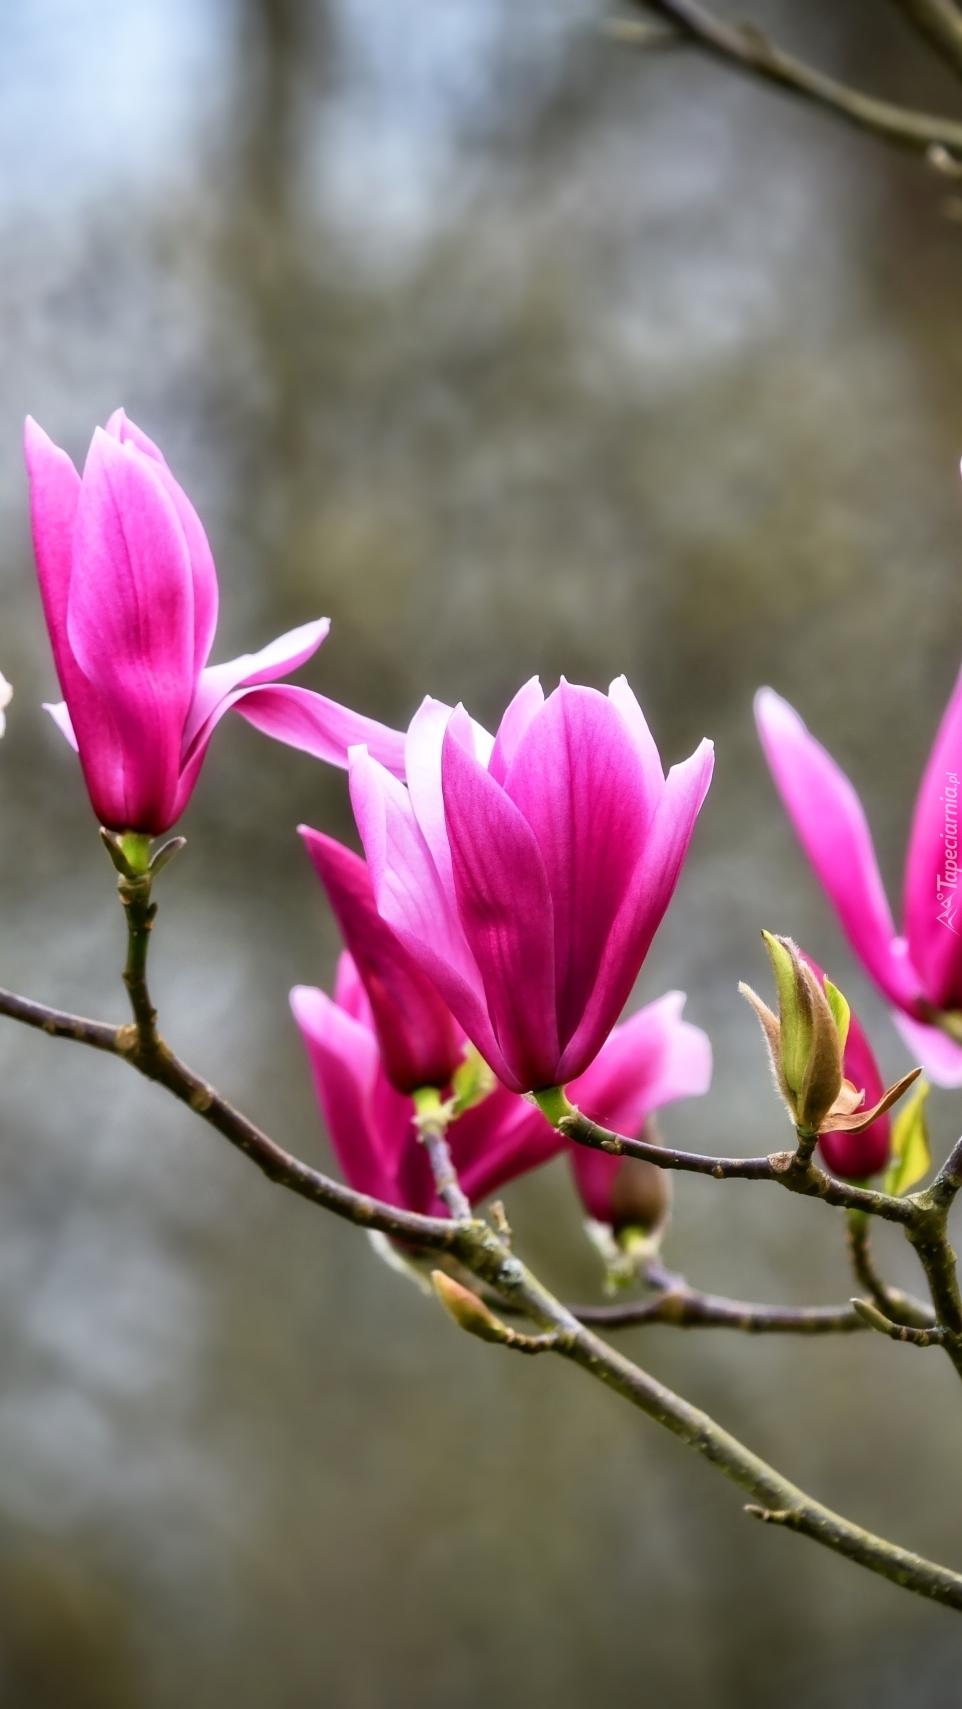 Purpurowa magnolia